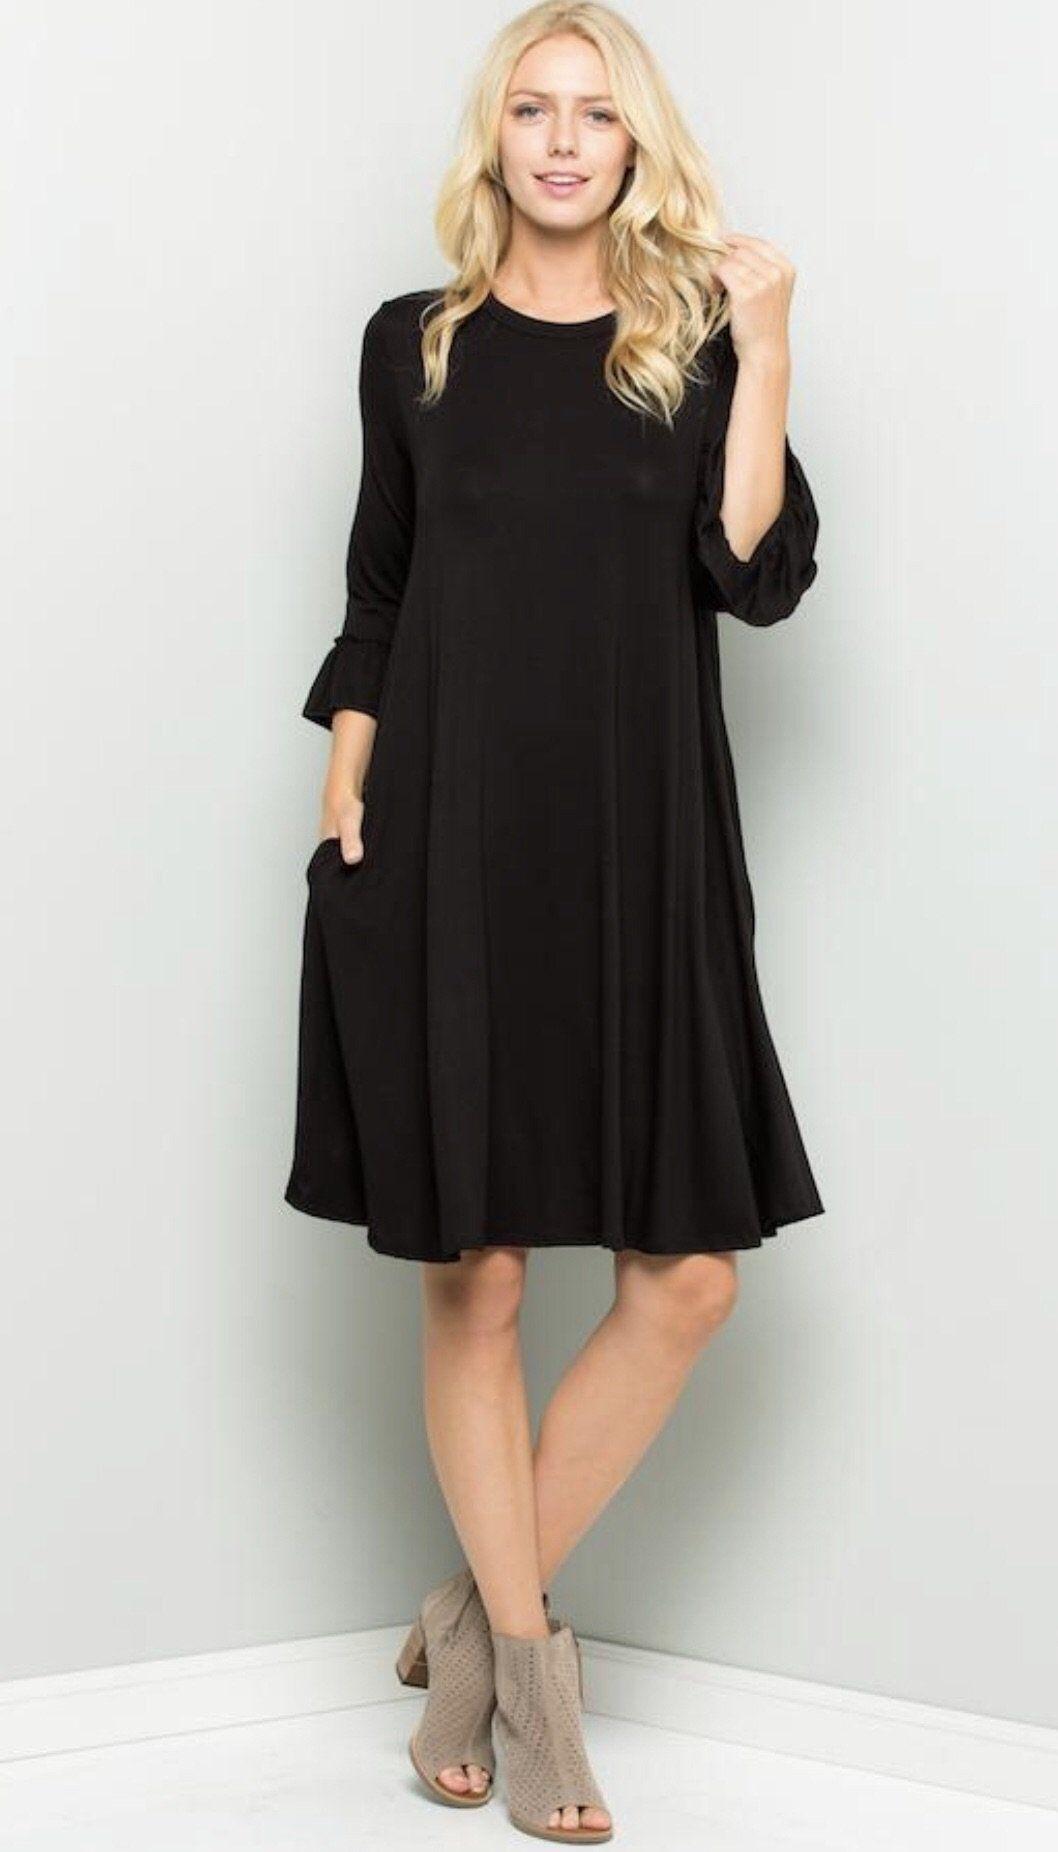 Casual little black dress black dress perfect little